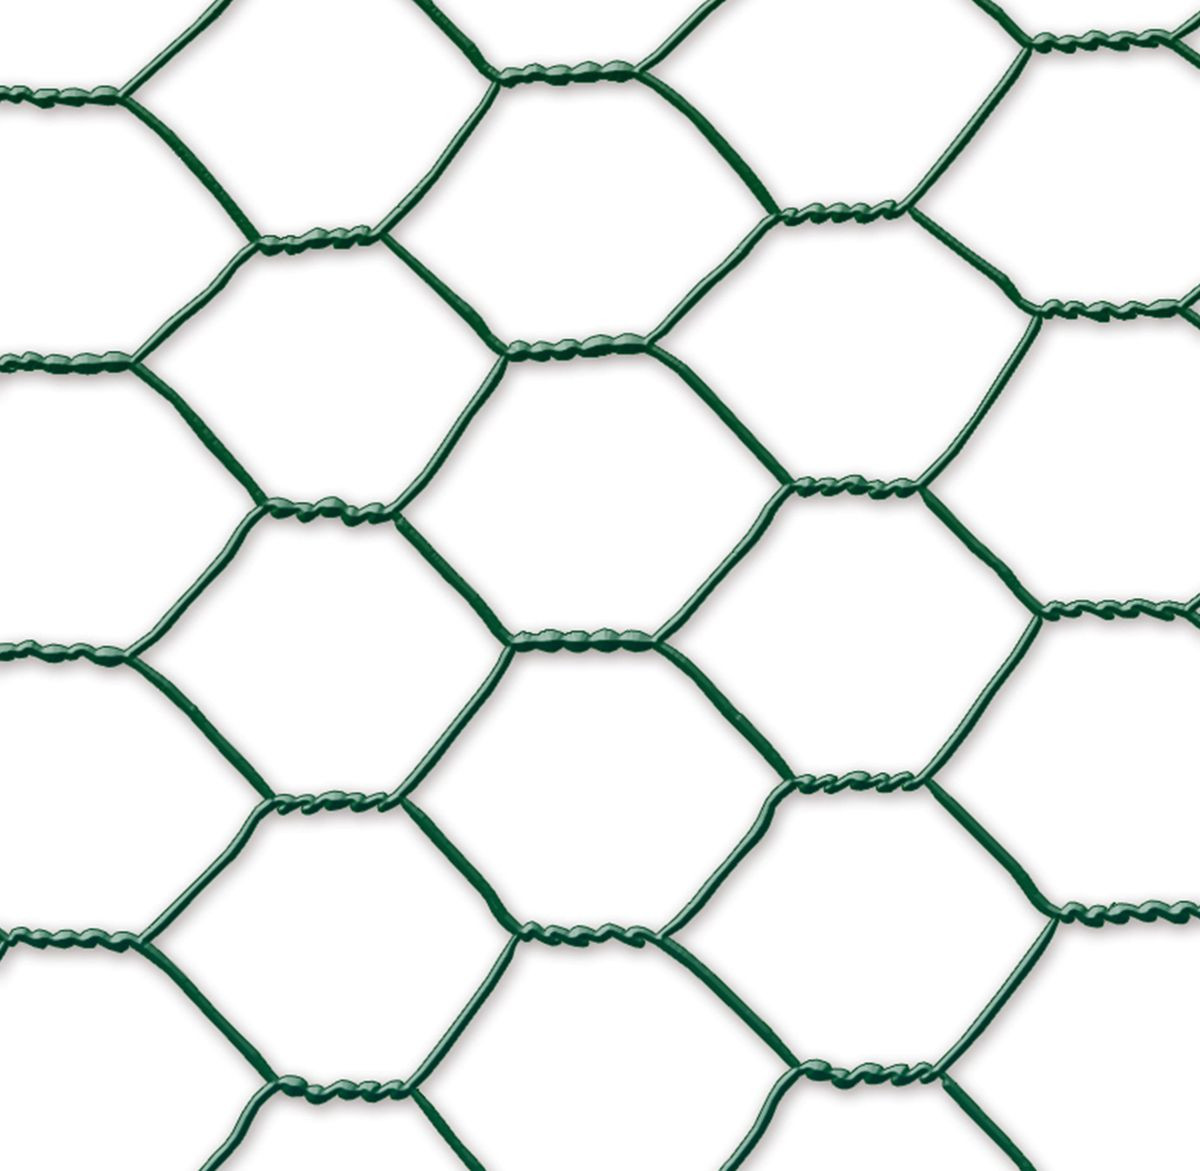 Grillage métal plastifié - 0,50 x 5 m/13 x 0,7 mm \